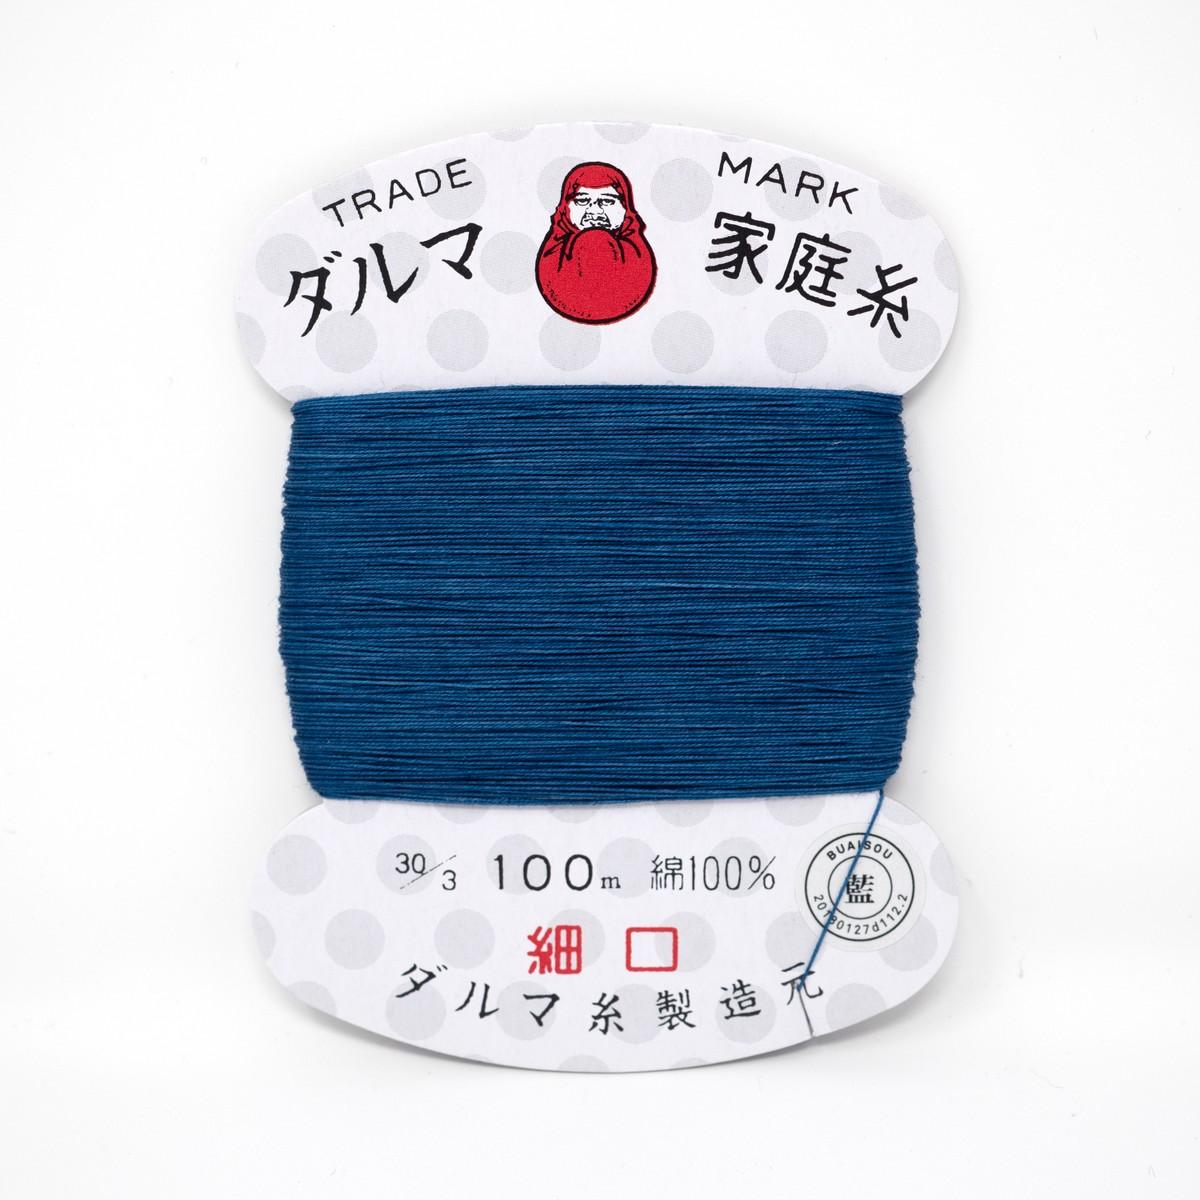 Photo of BUAISOU Sewing Thread: Medium Blue